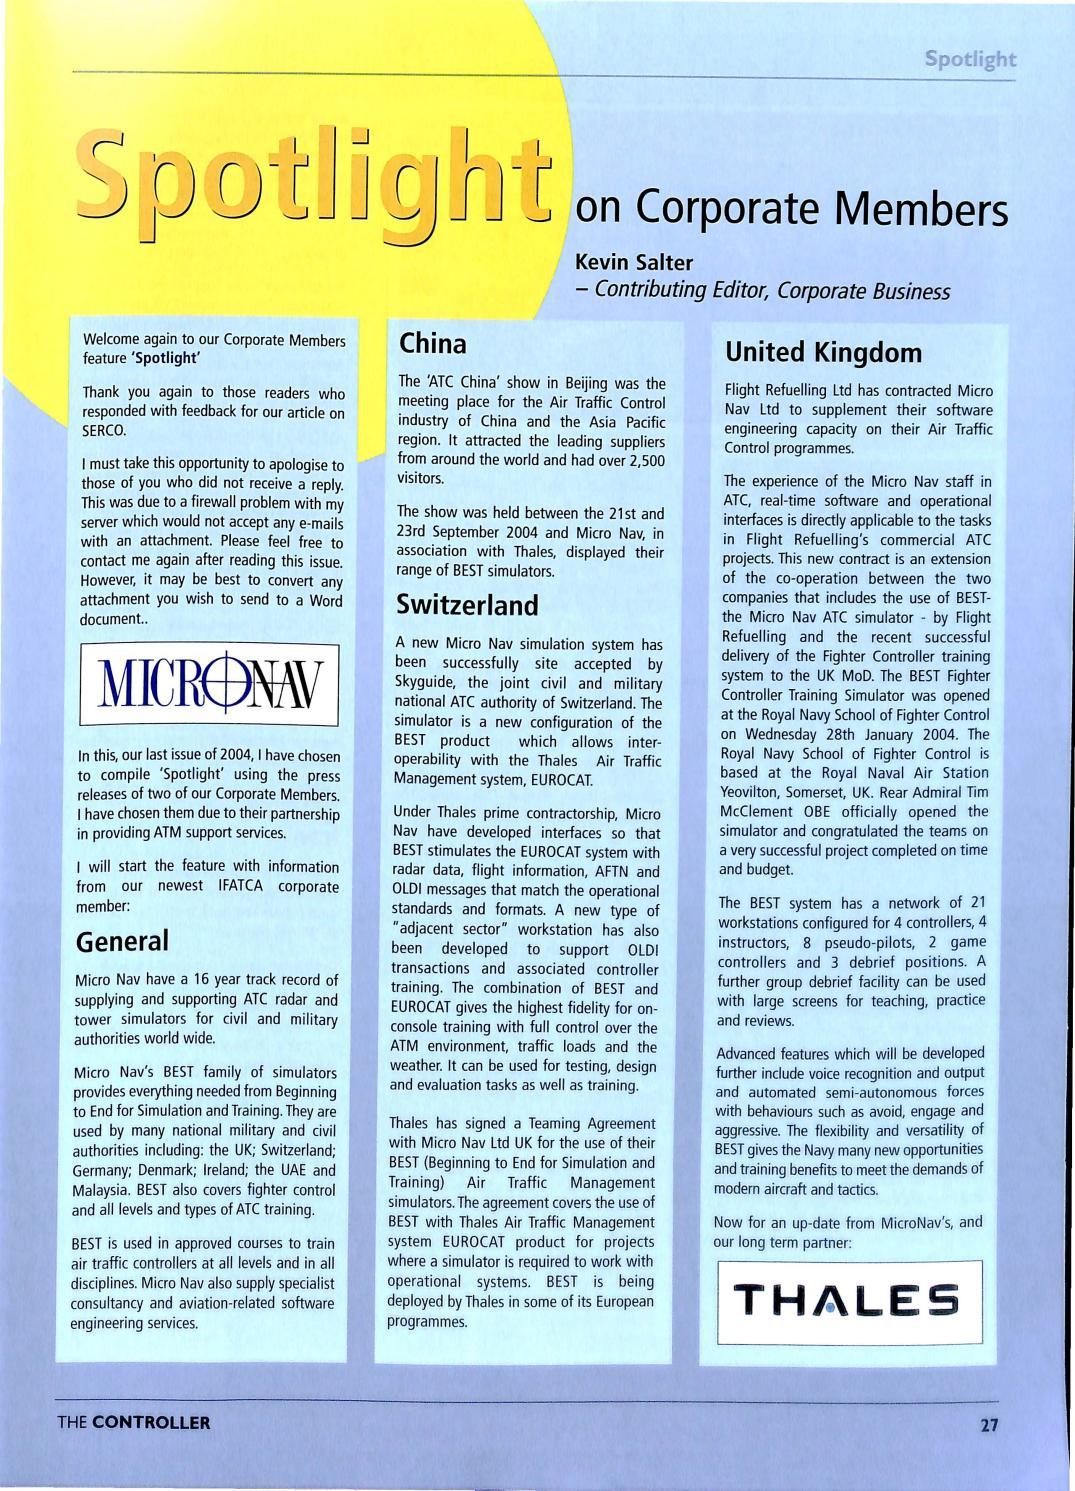 IFATCA The Controller - 4th quarter 2004 by IFATCA - issuu